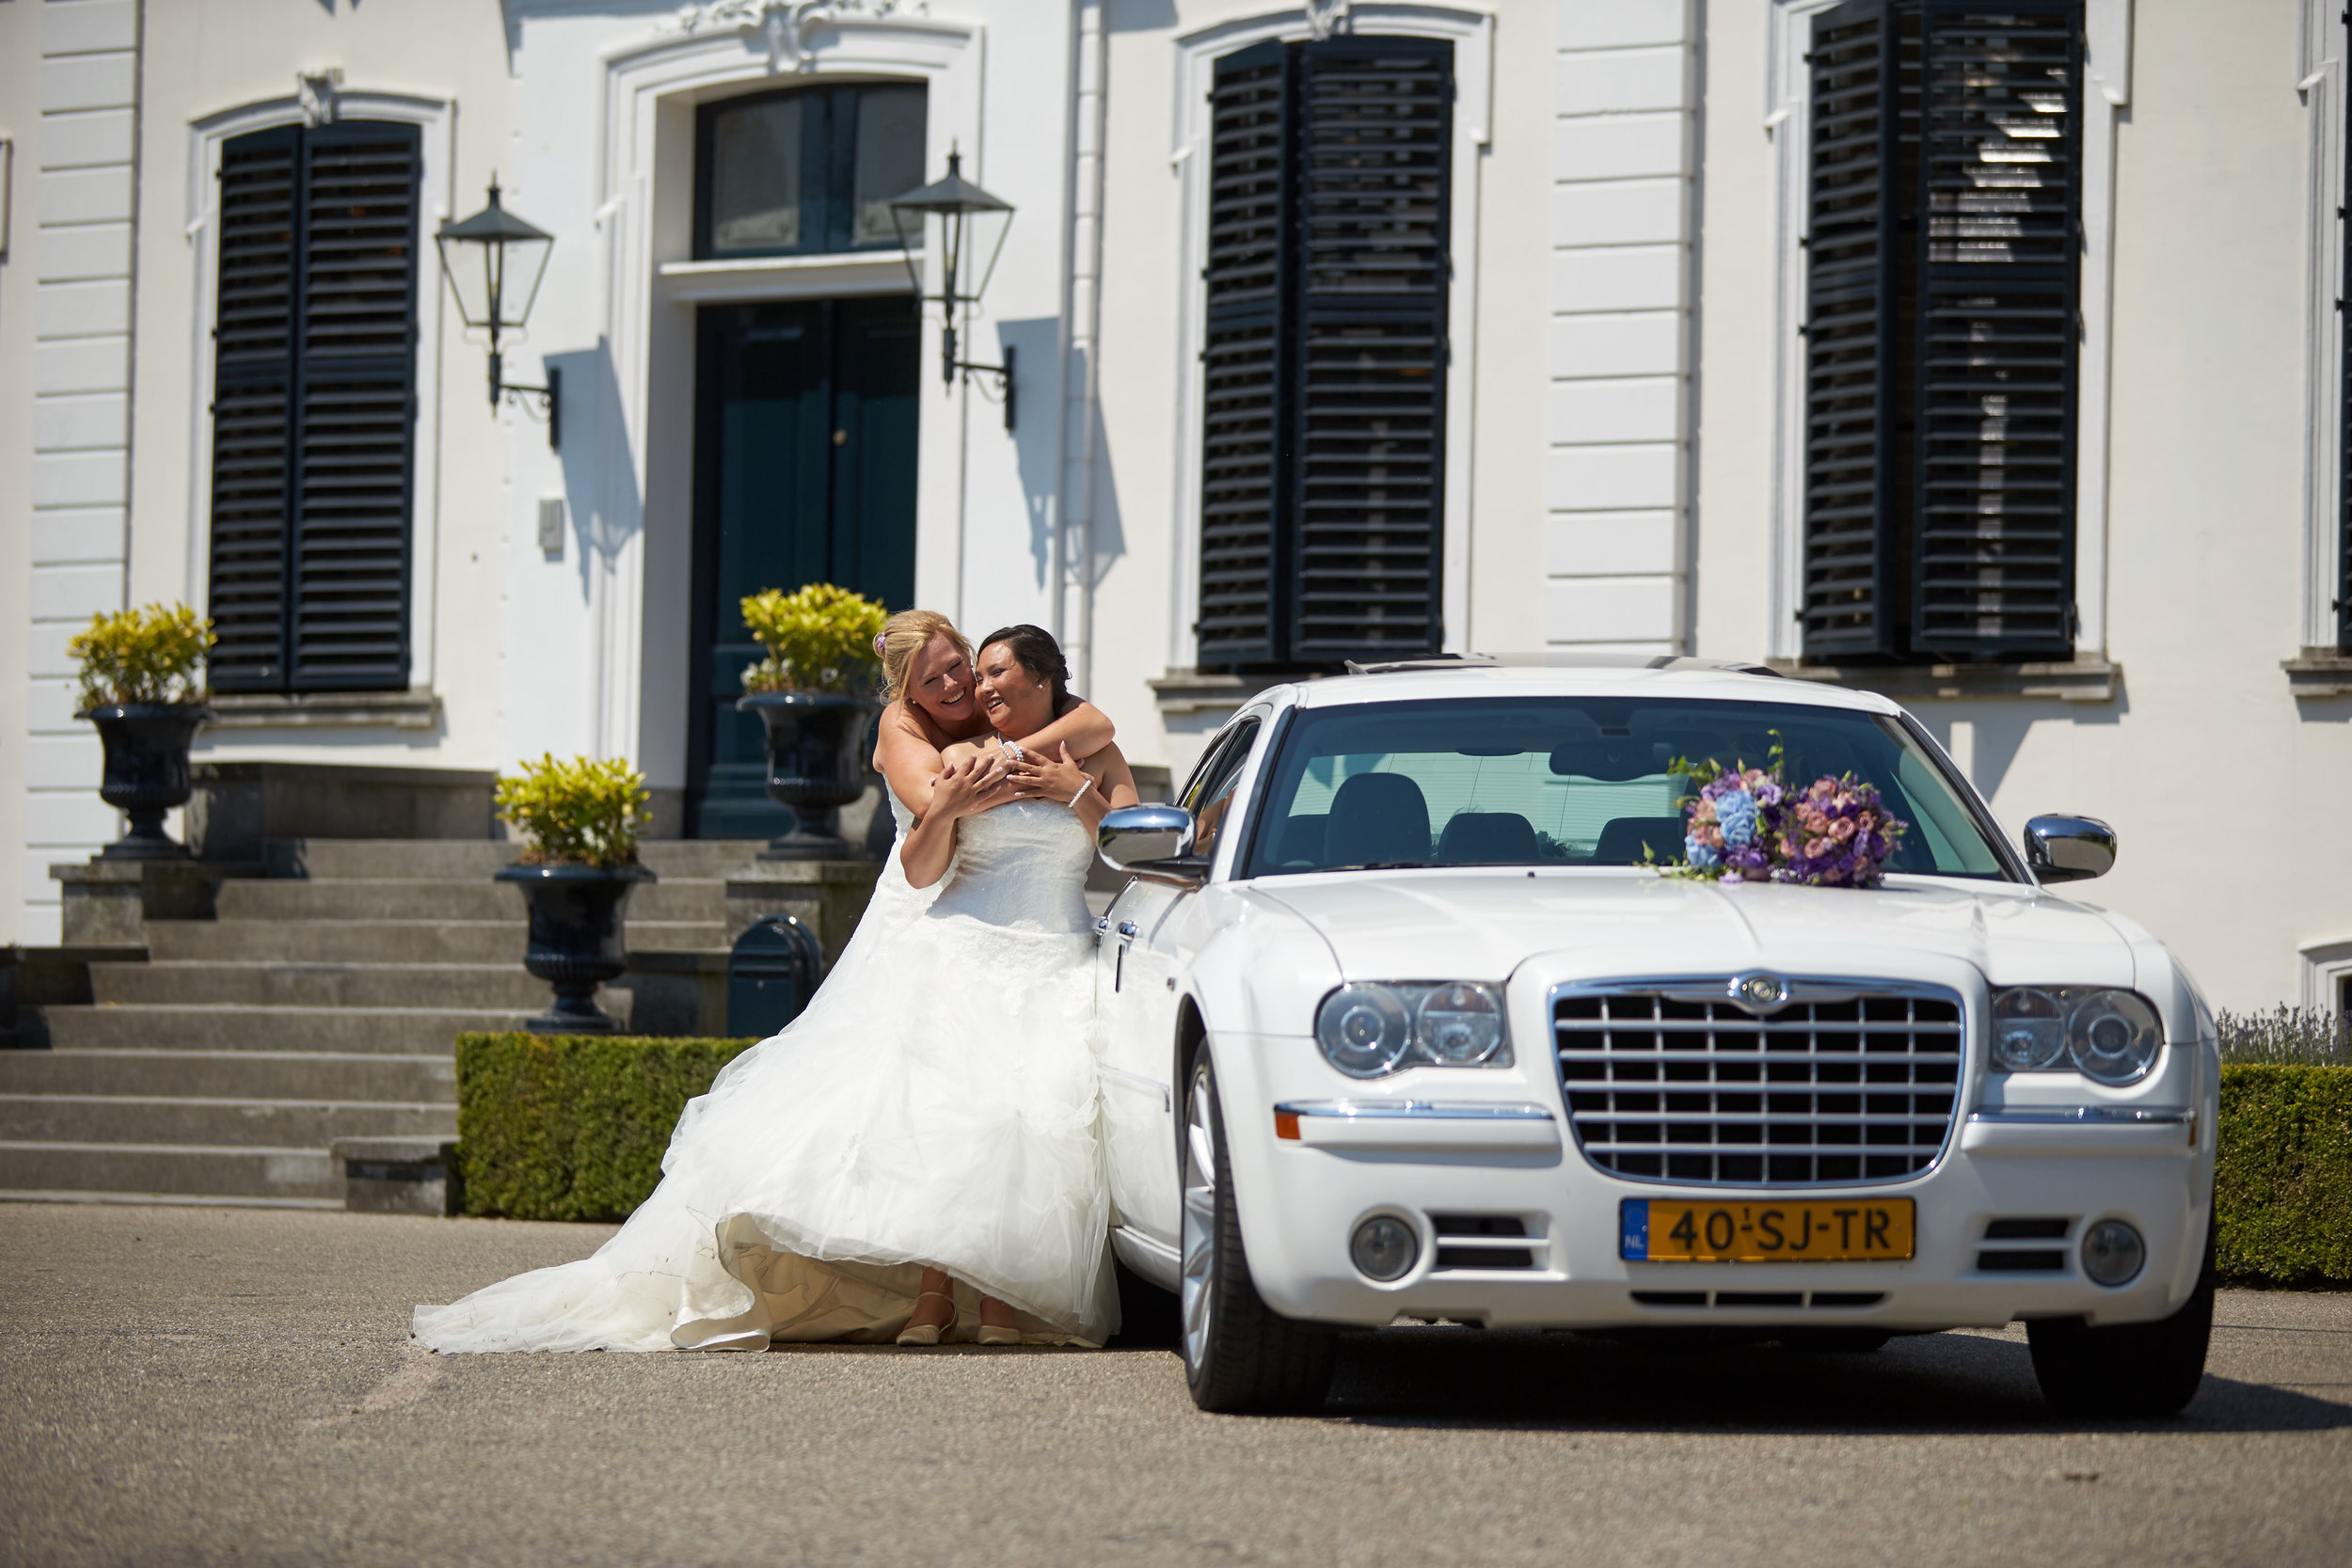 trouwshoot-bruidsfotografie-trouwfoto-feestfotografie-Prunella en Cora22.jpg